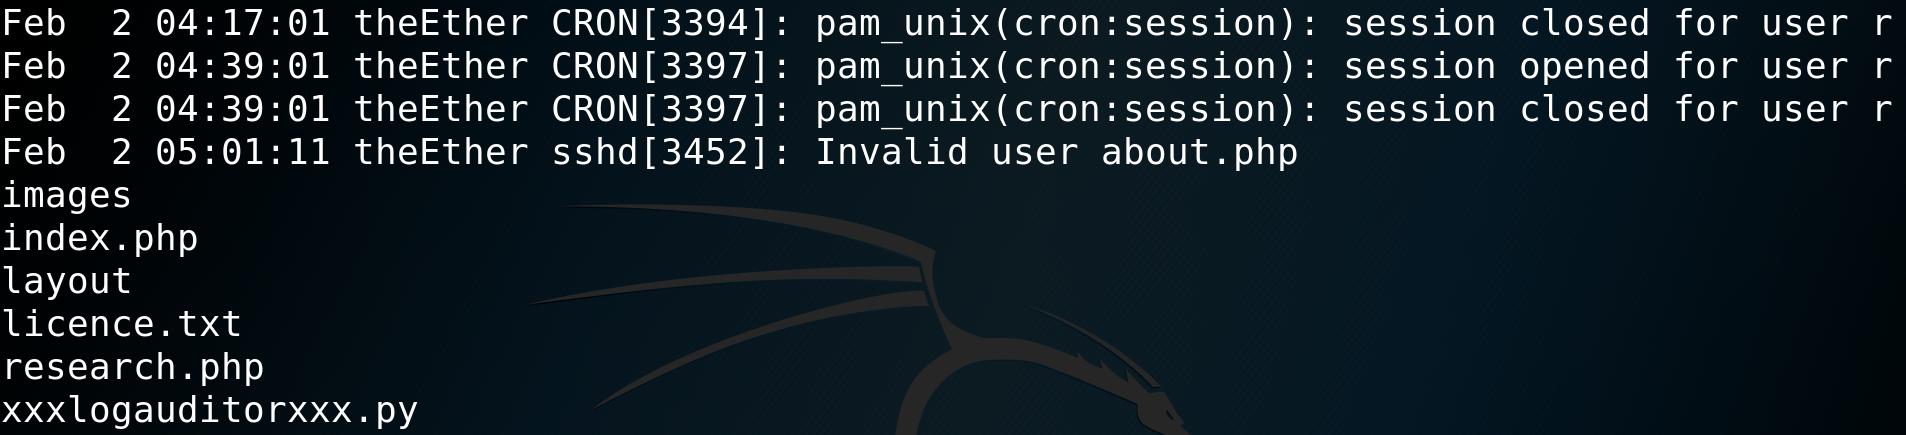 Listing directory contents via an RCE (contaminating ssh auth.log) - CTF - vulnhub - walkthrough